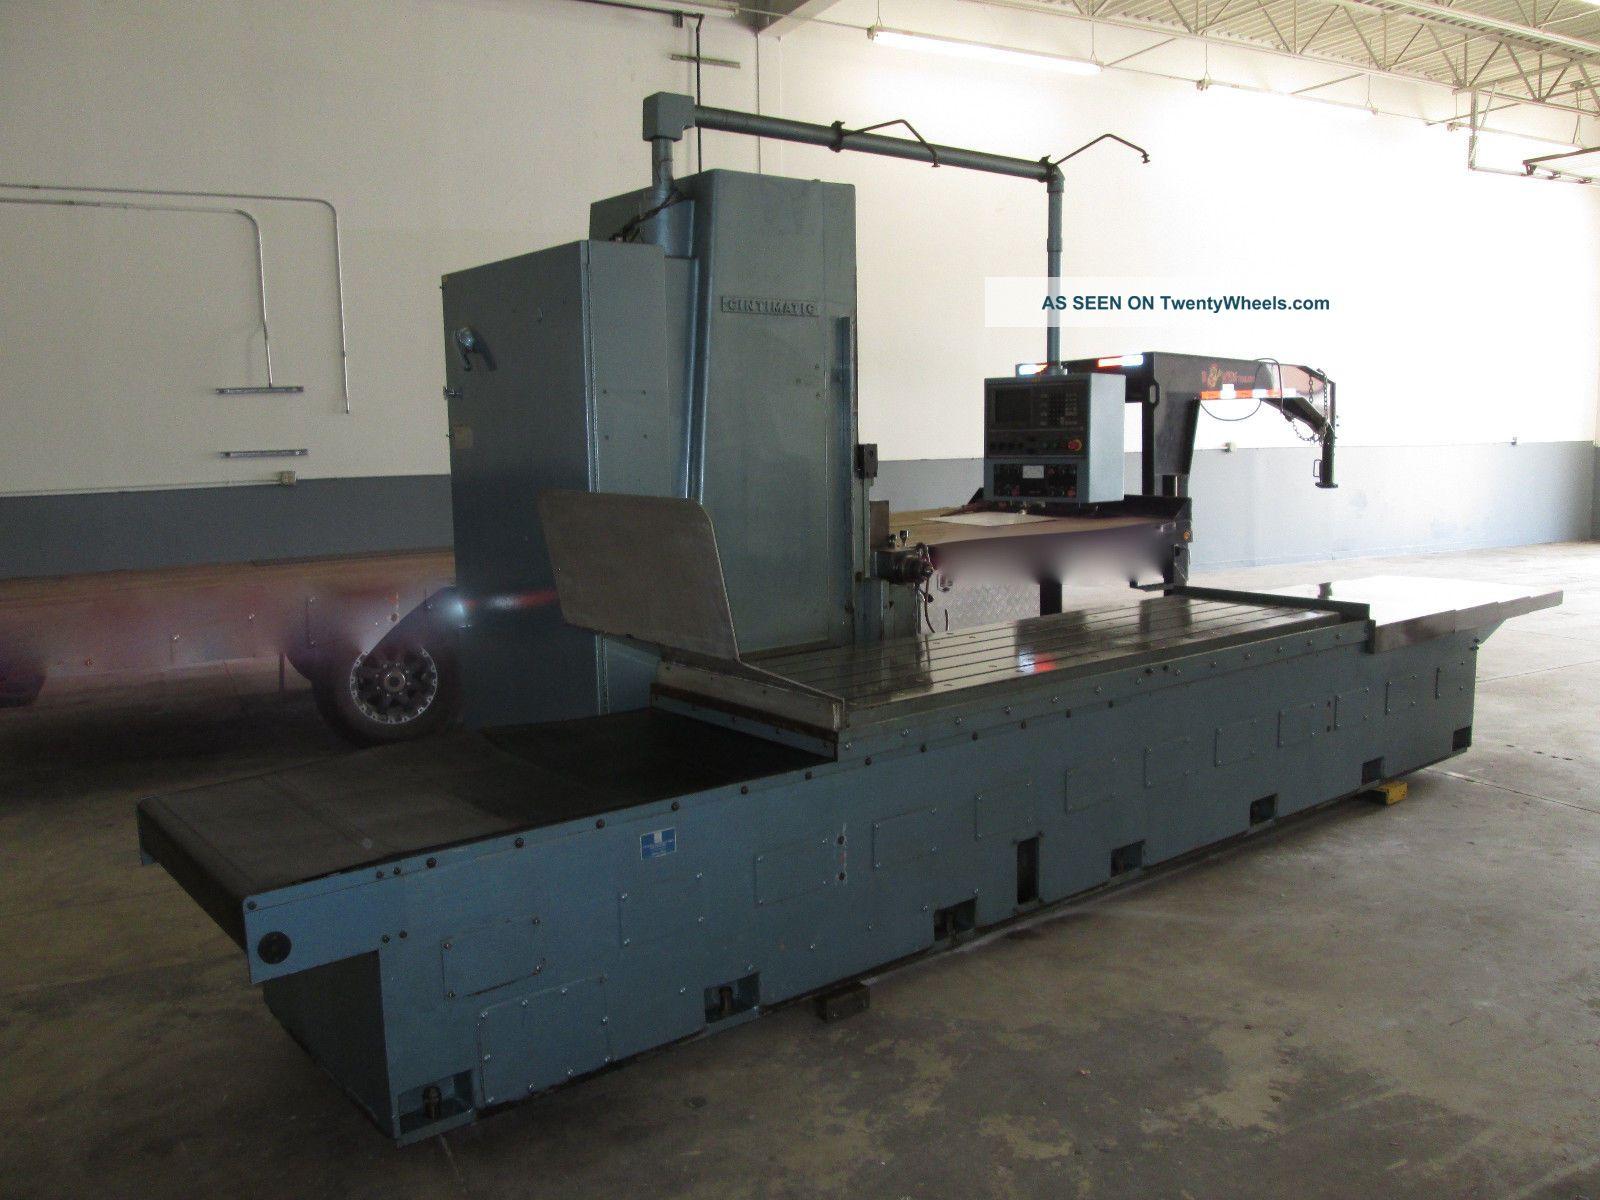 Cincinnati H - 100 Cnc Milling Machine,  Dynapth Control Milling Machines photo